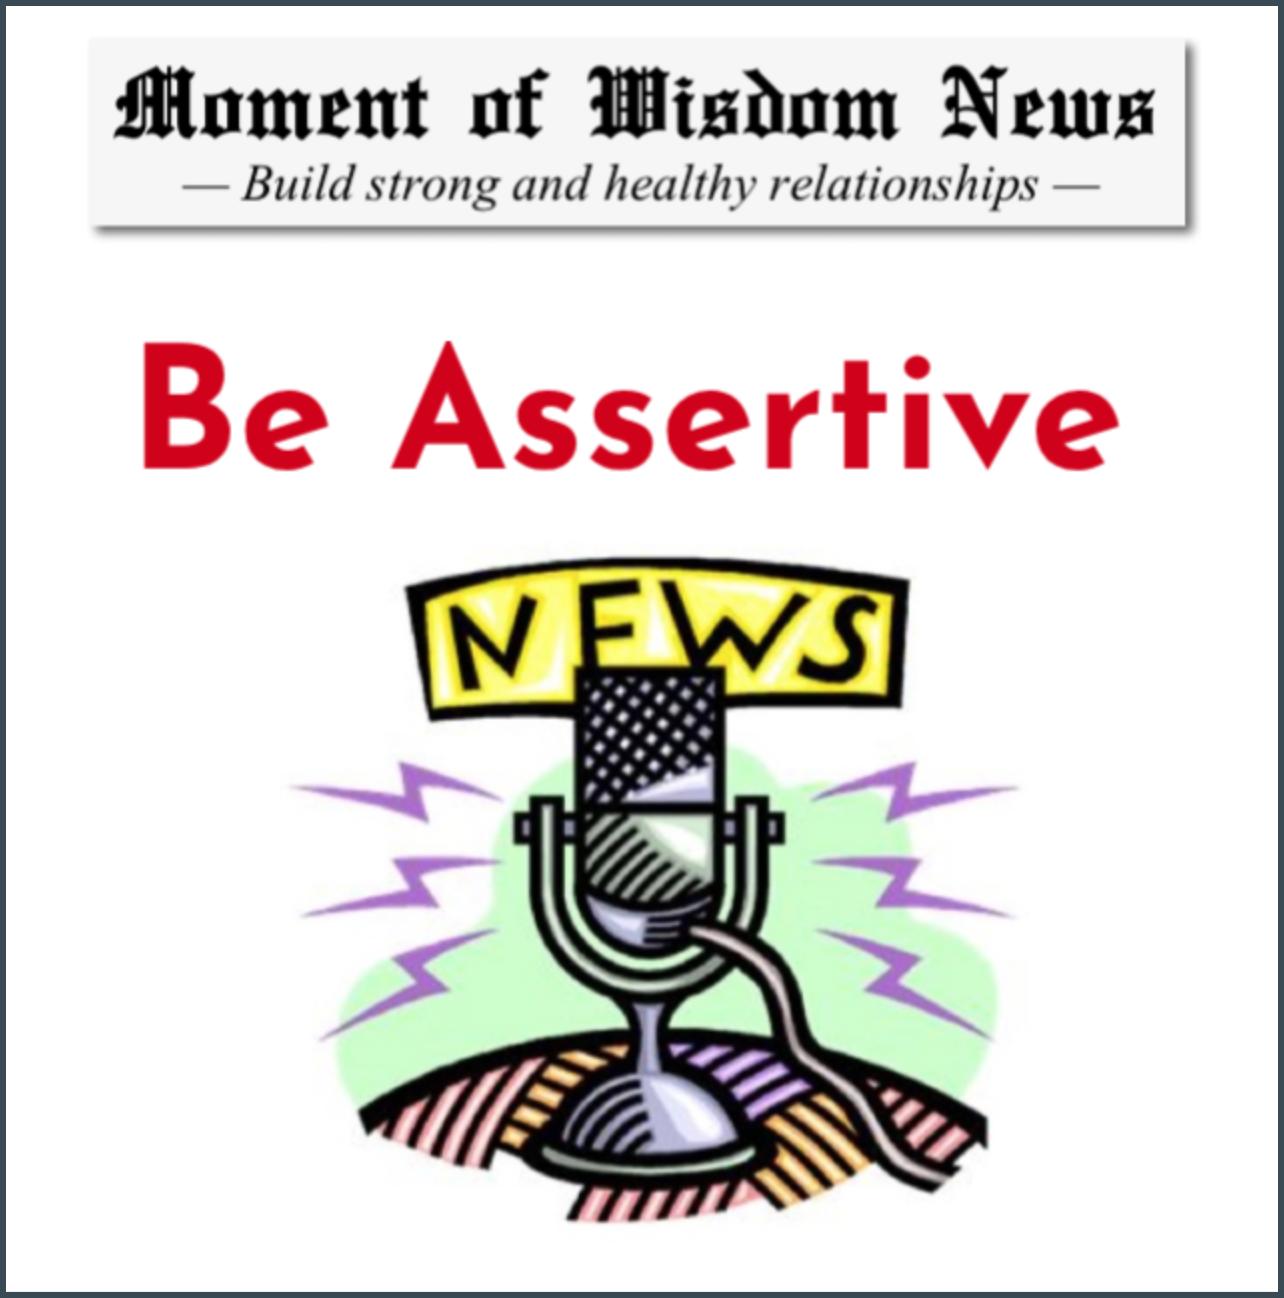 - Be Assertive